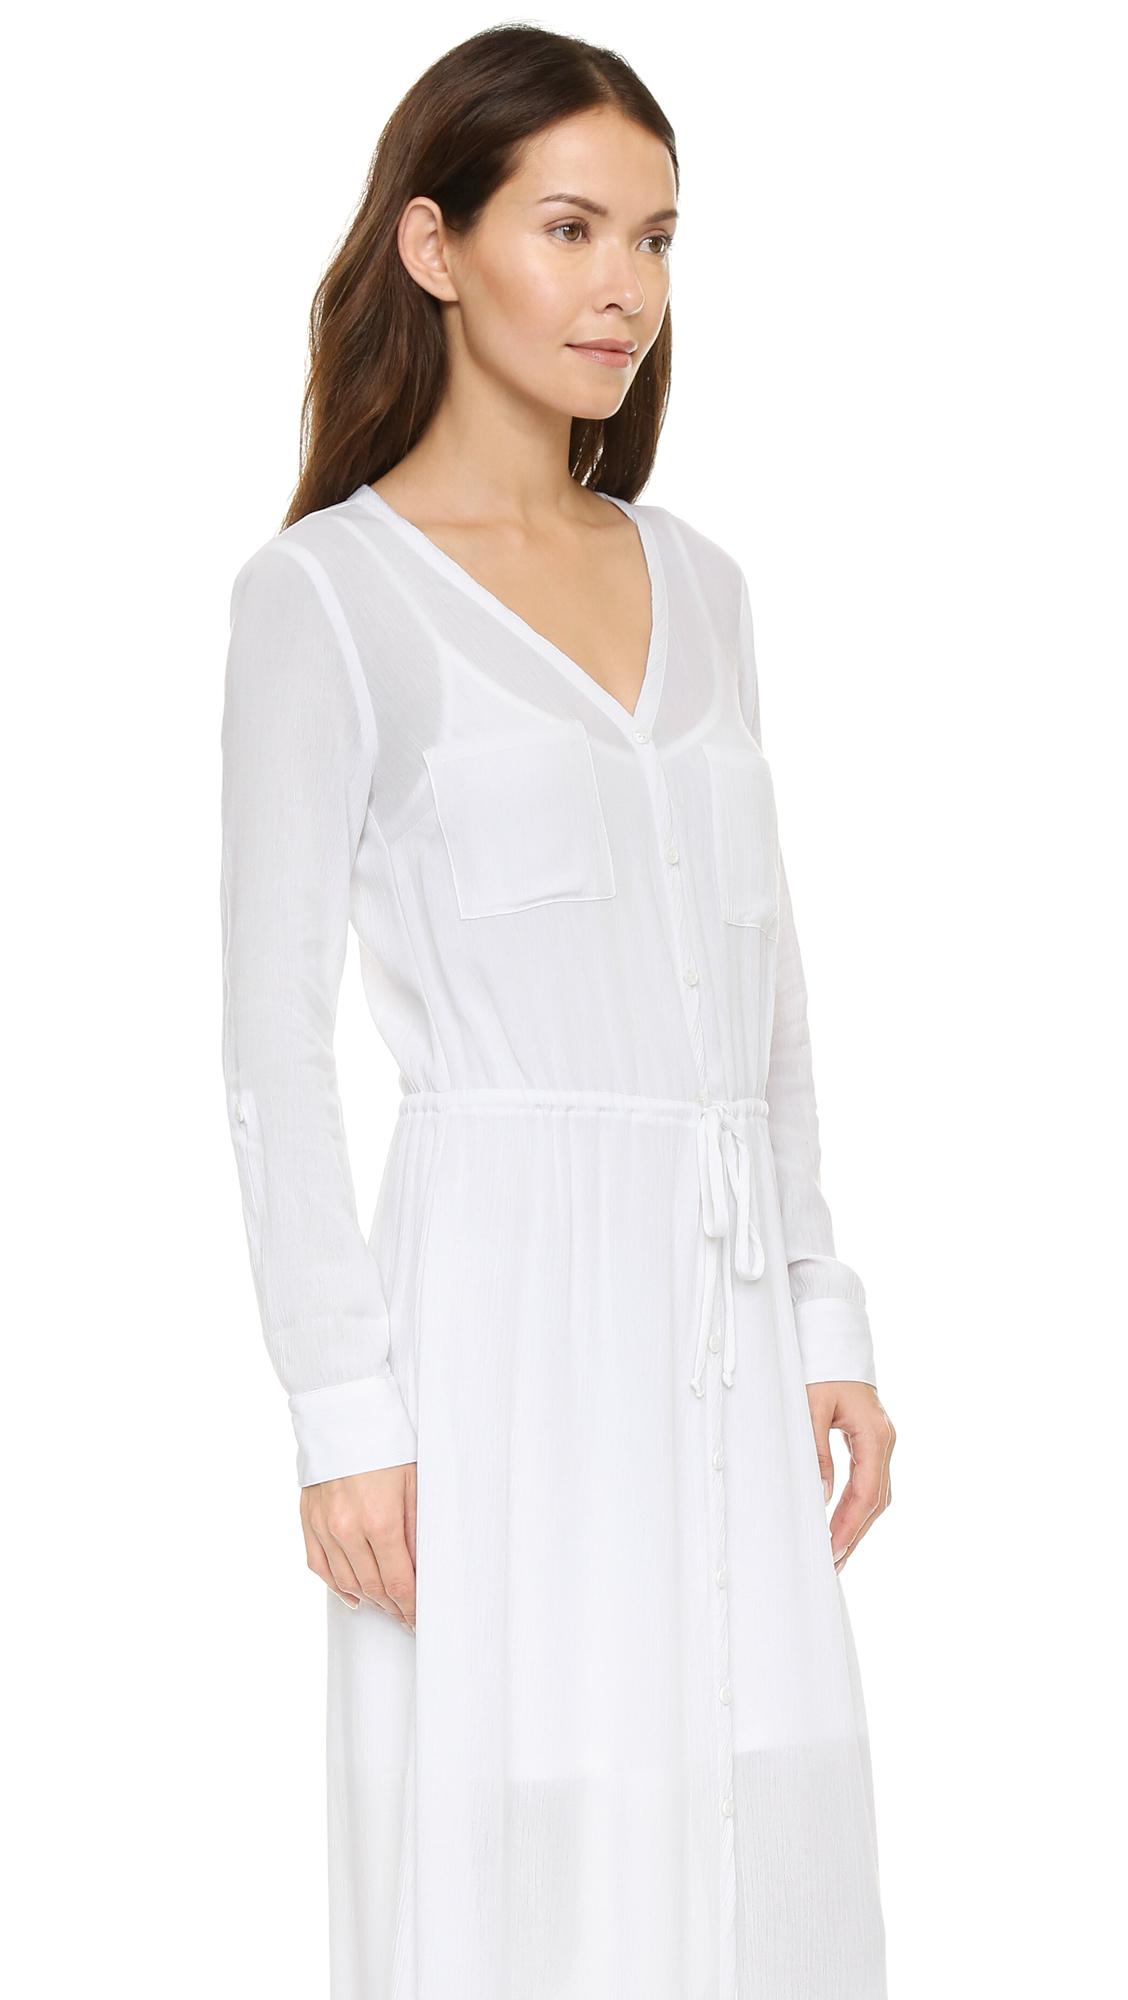 bbcbac3ea Splendid Gauze Maxi Shirt Dress - White in White - Lyst